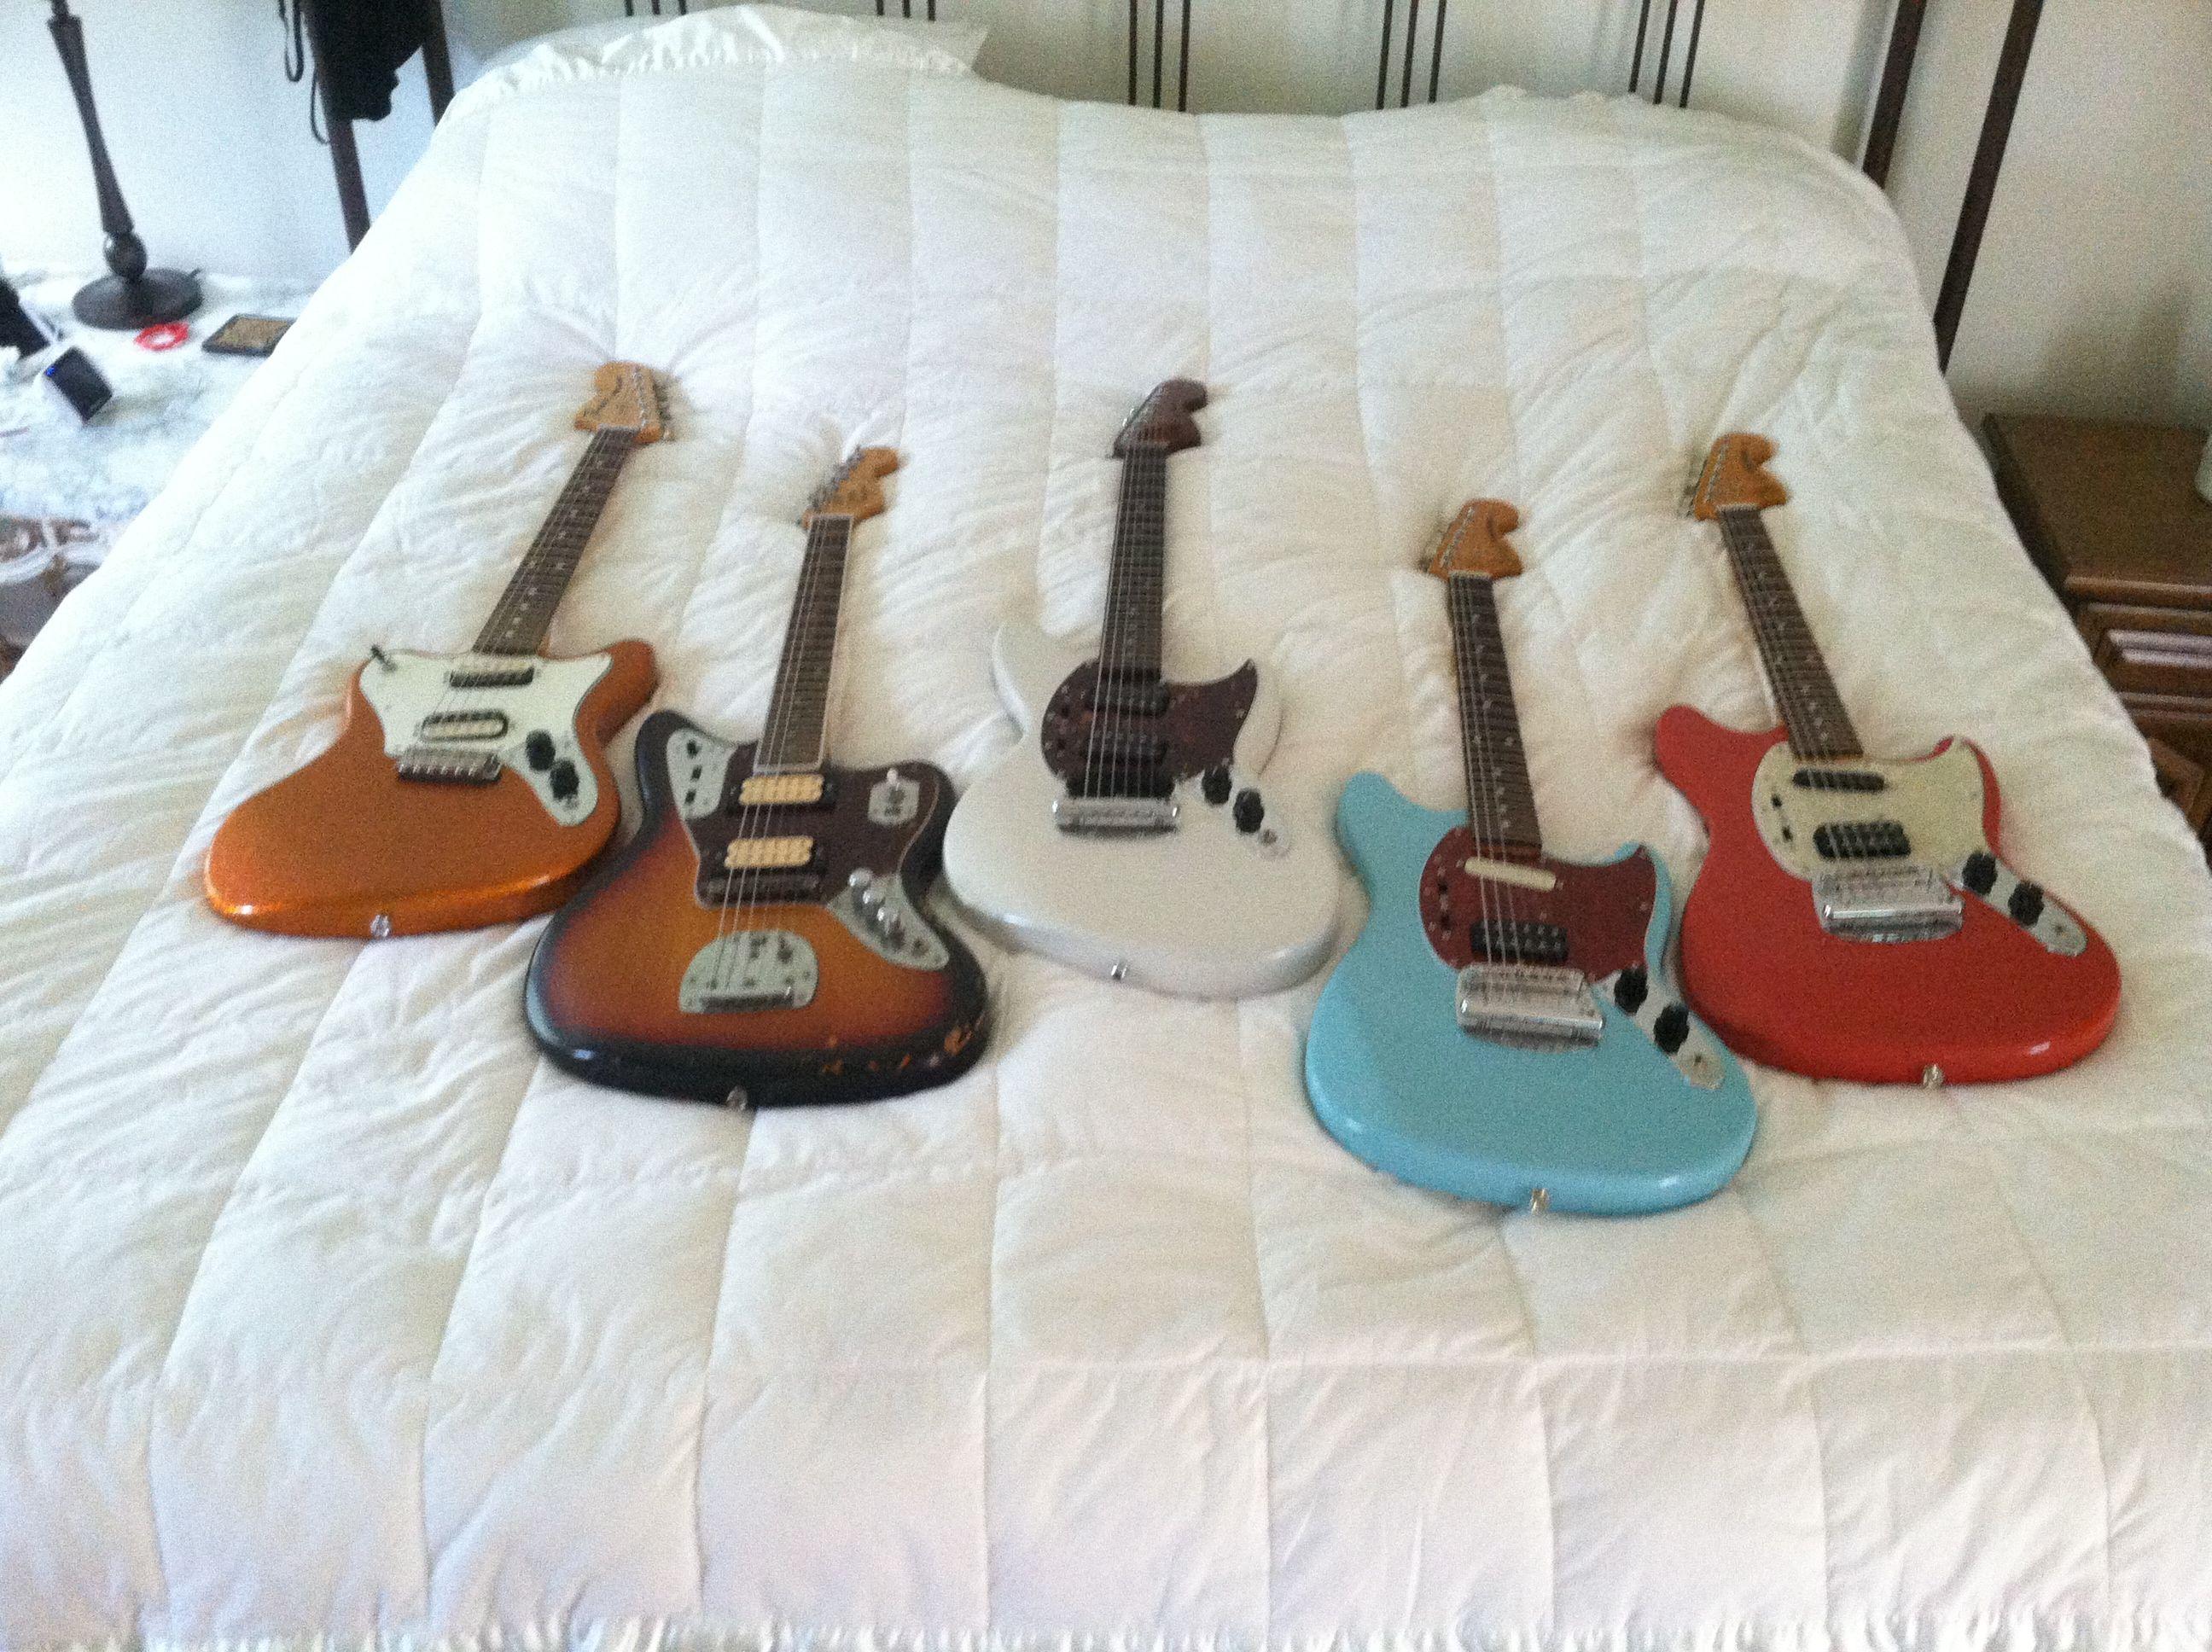 Fender Pawn Shop Super Sonic guitar Kurt Cobain Fender Jaguar and Mustangs with a Jagstang